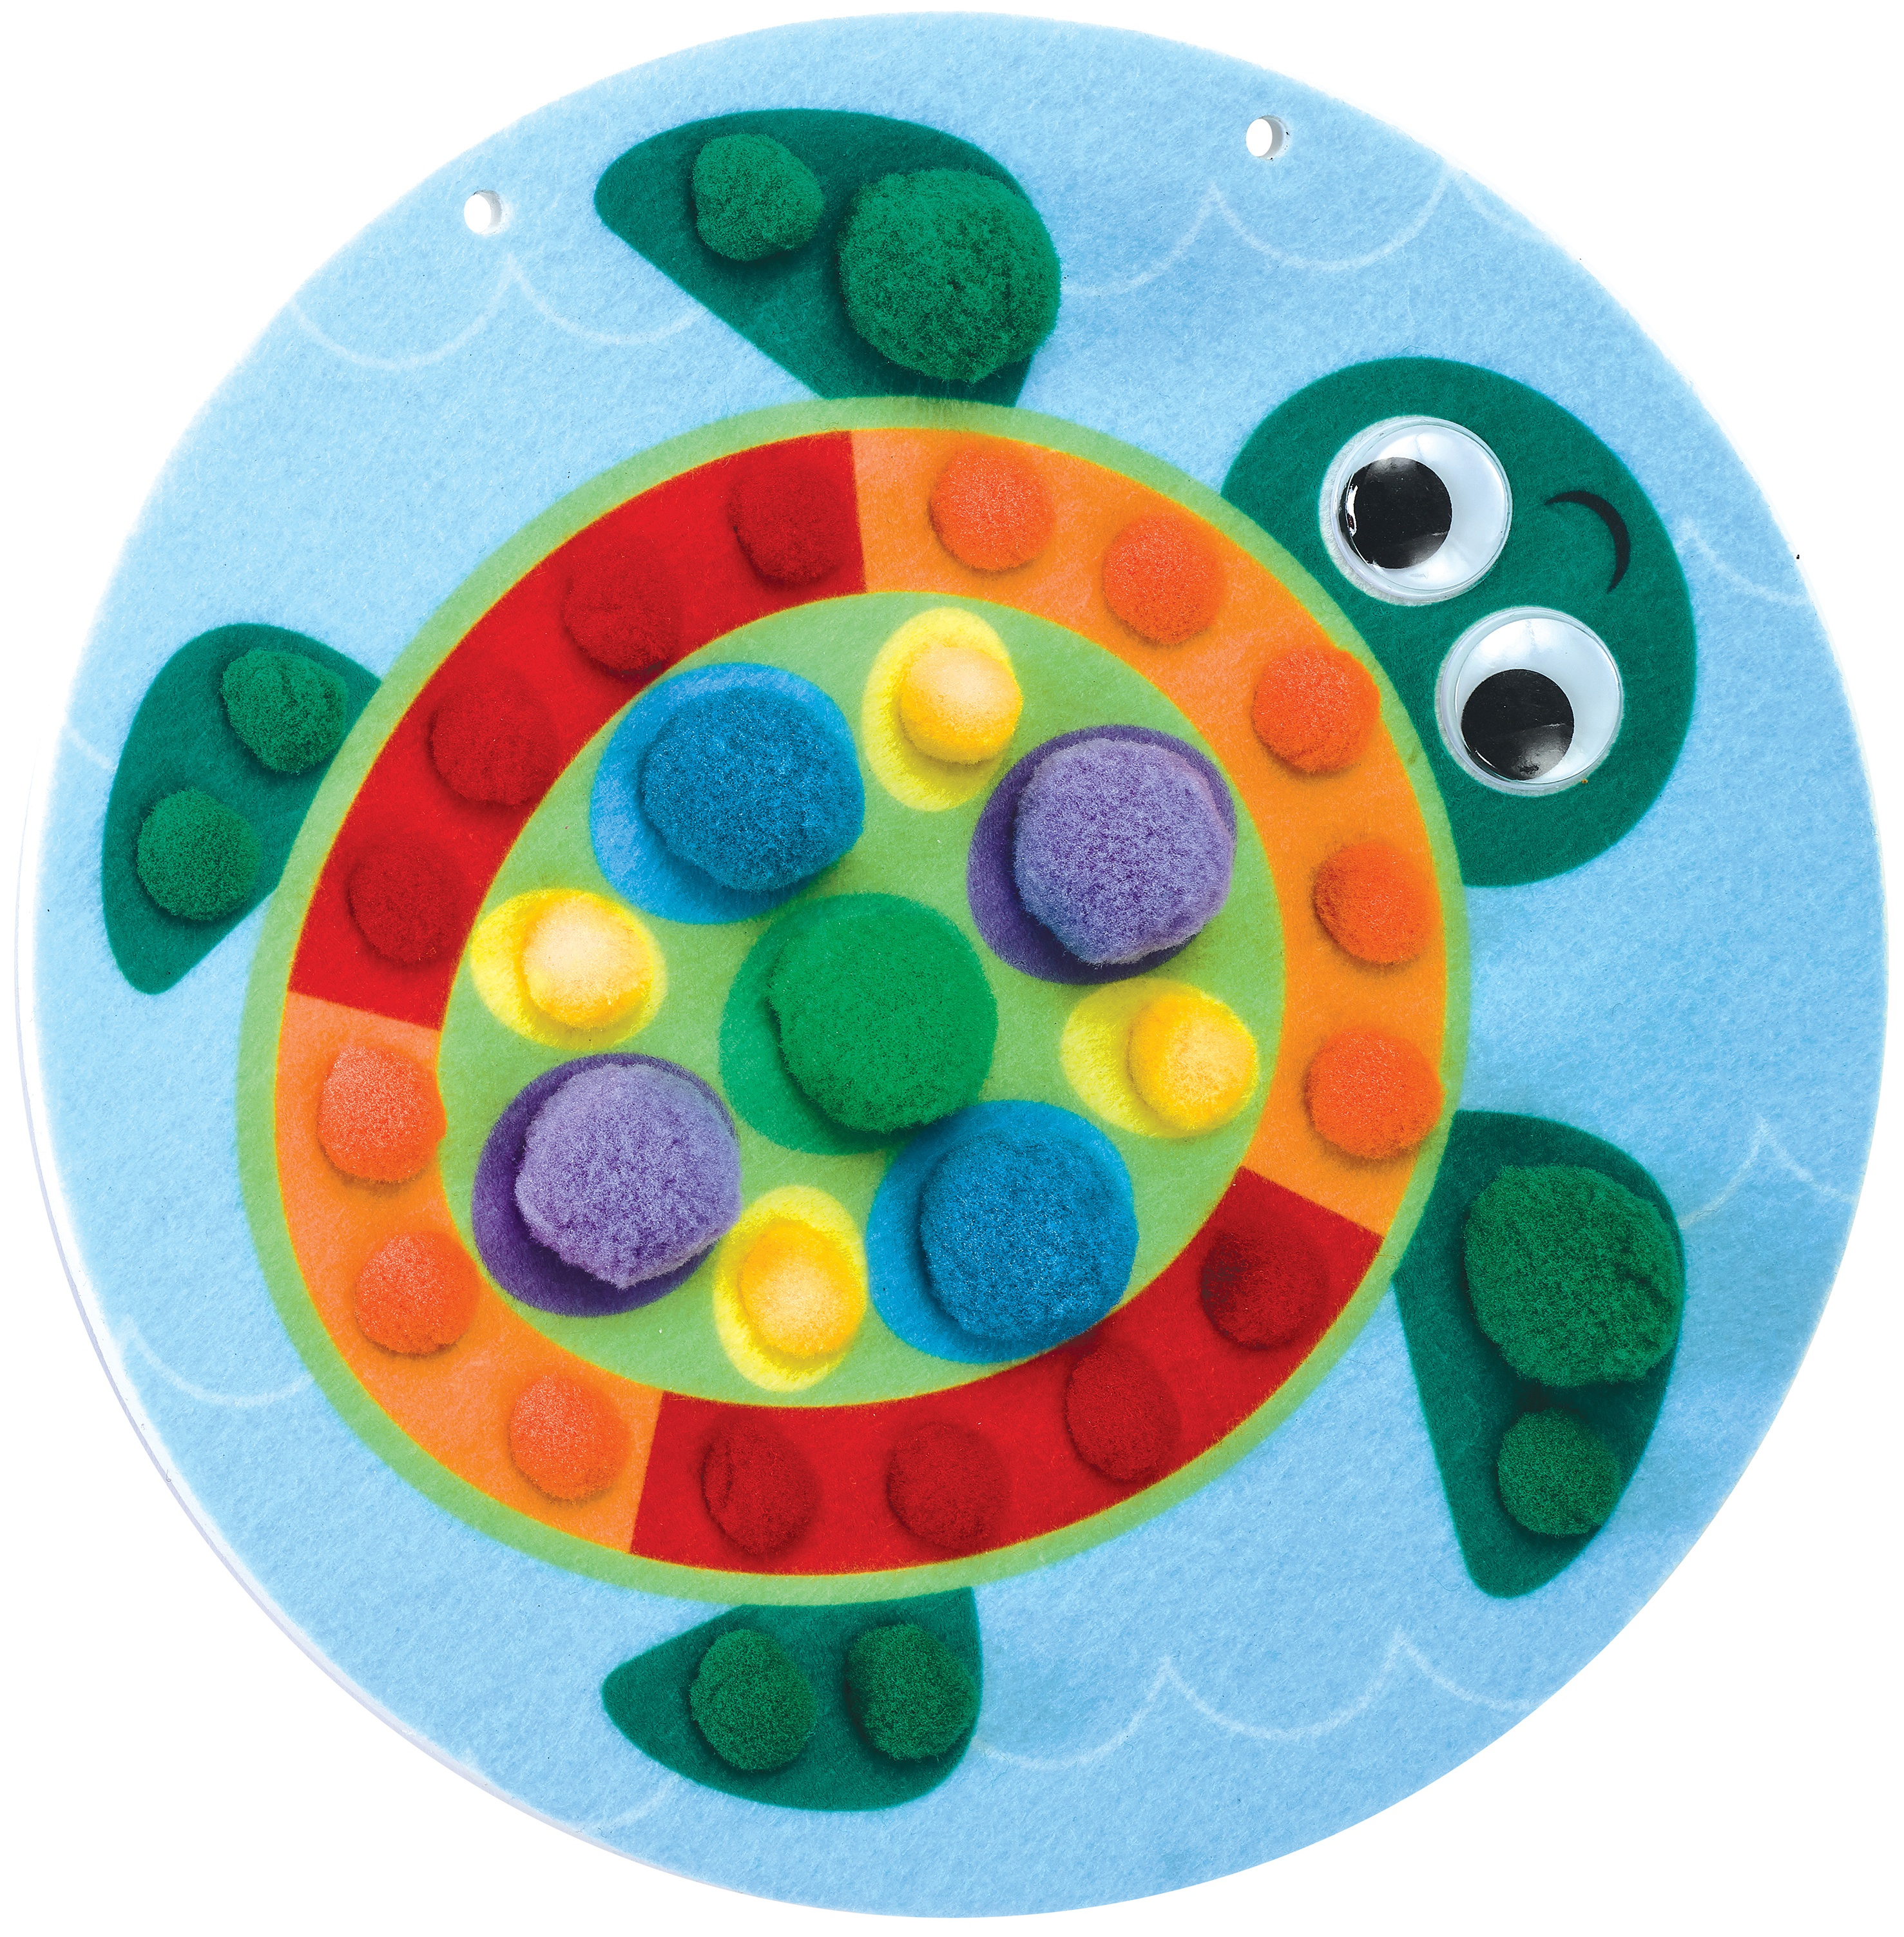 Creativity For Kids Pom Pom Pictures-